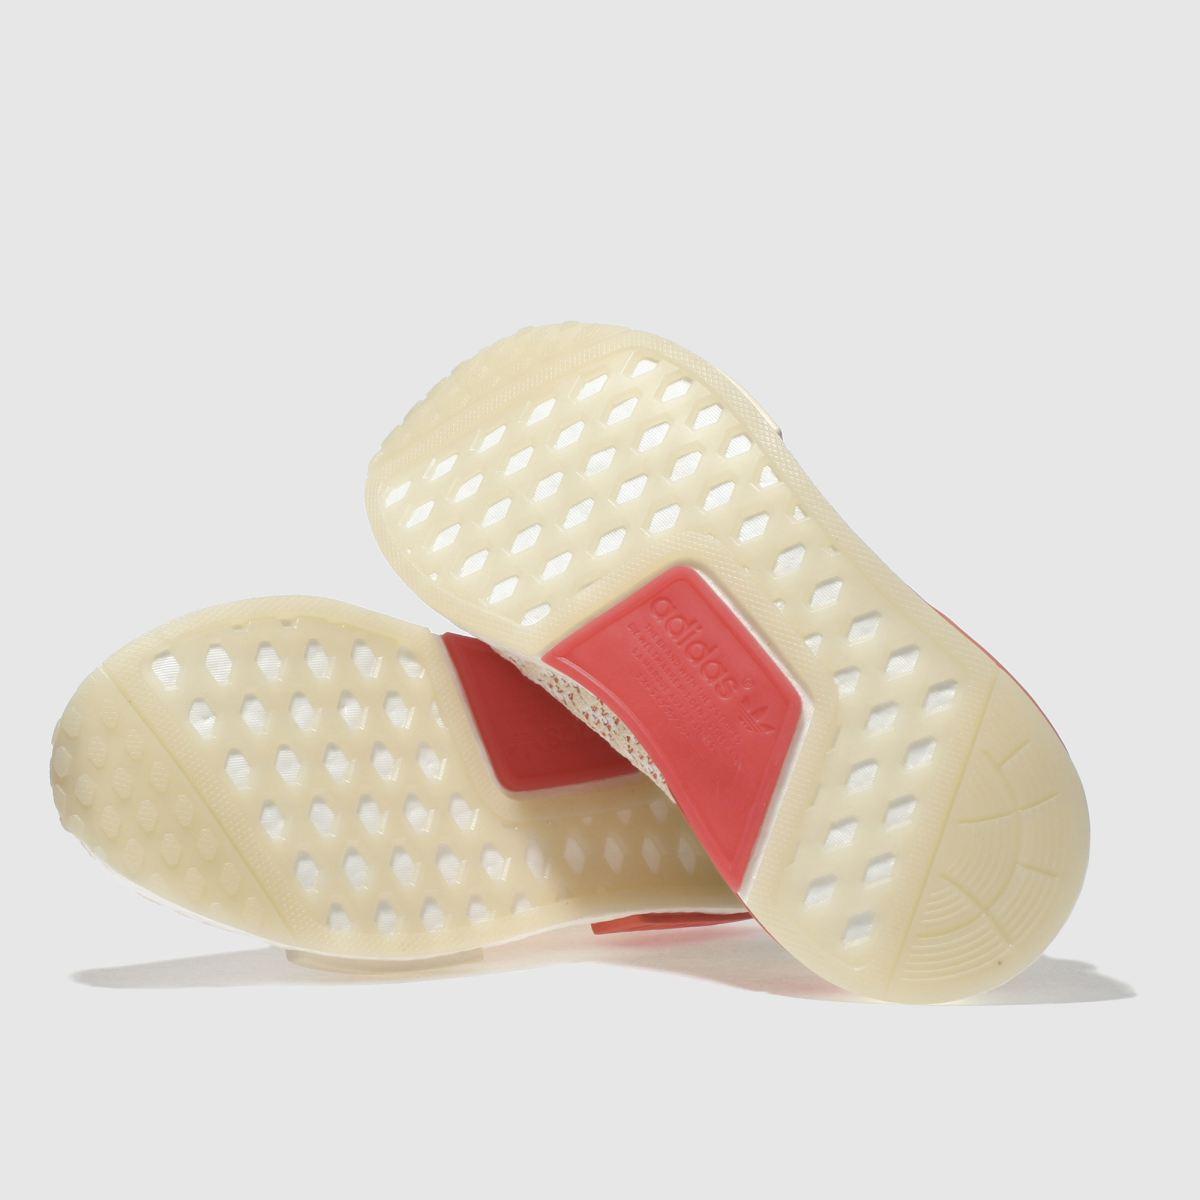 Damen Primeknit Naturfarben adidas Nmd_r1 Stlt Primeknit Damen Sneaker   schuh Gute Qualität beliebte Schuhe 891f40